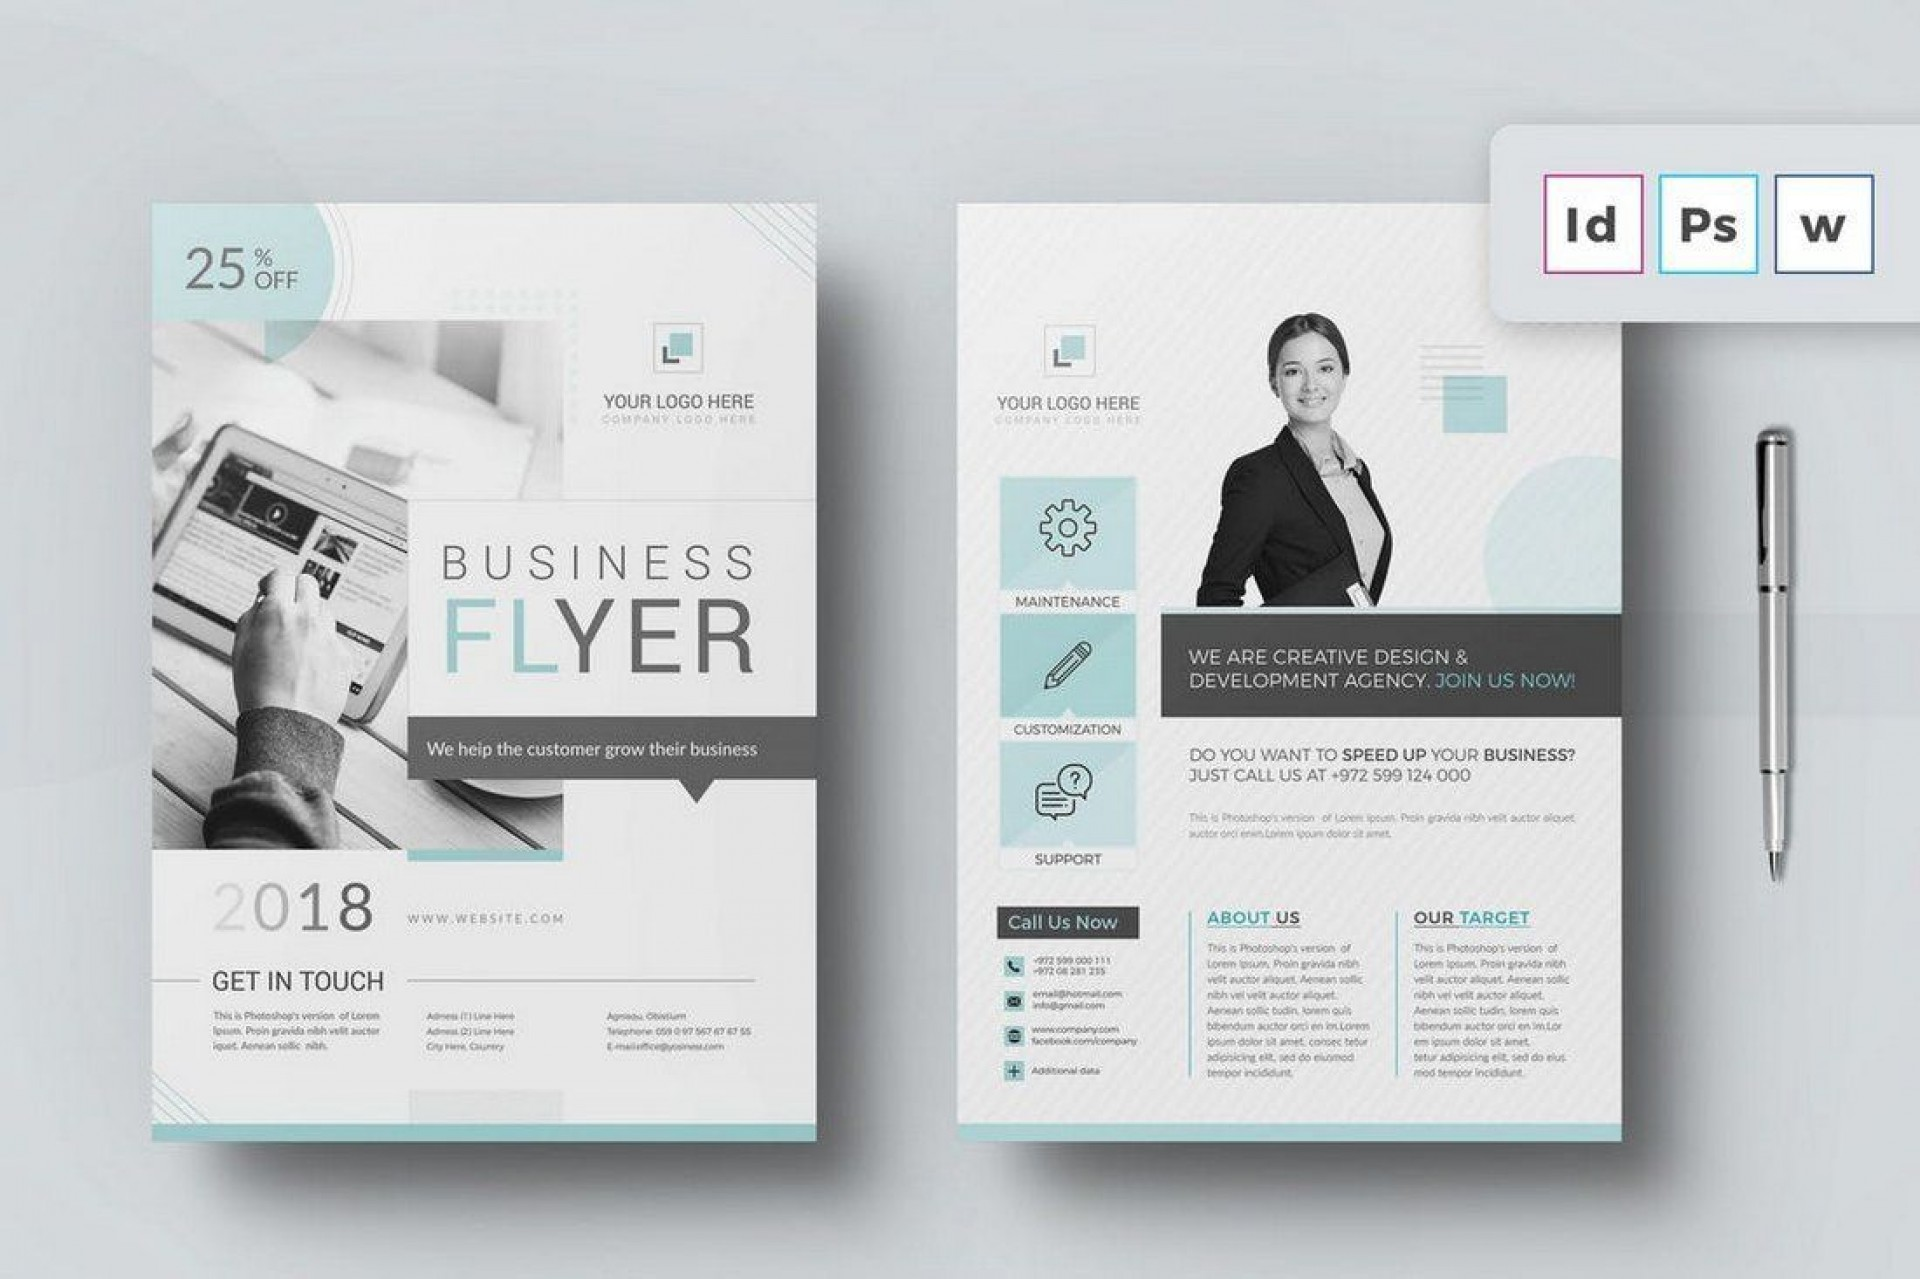 005 Beautiful Microsoft Word Brochure Template Inspiration  Templates 2010 Tri Fold A4 2007 Free Download1920